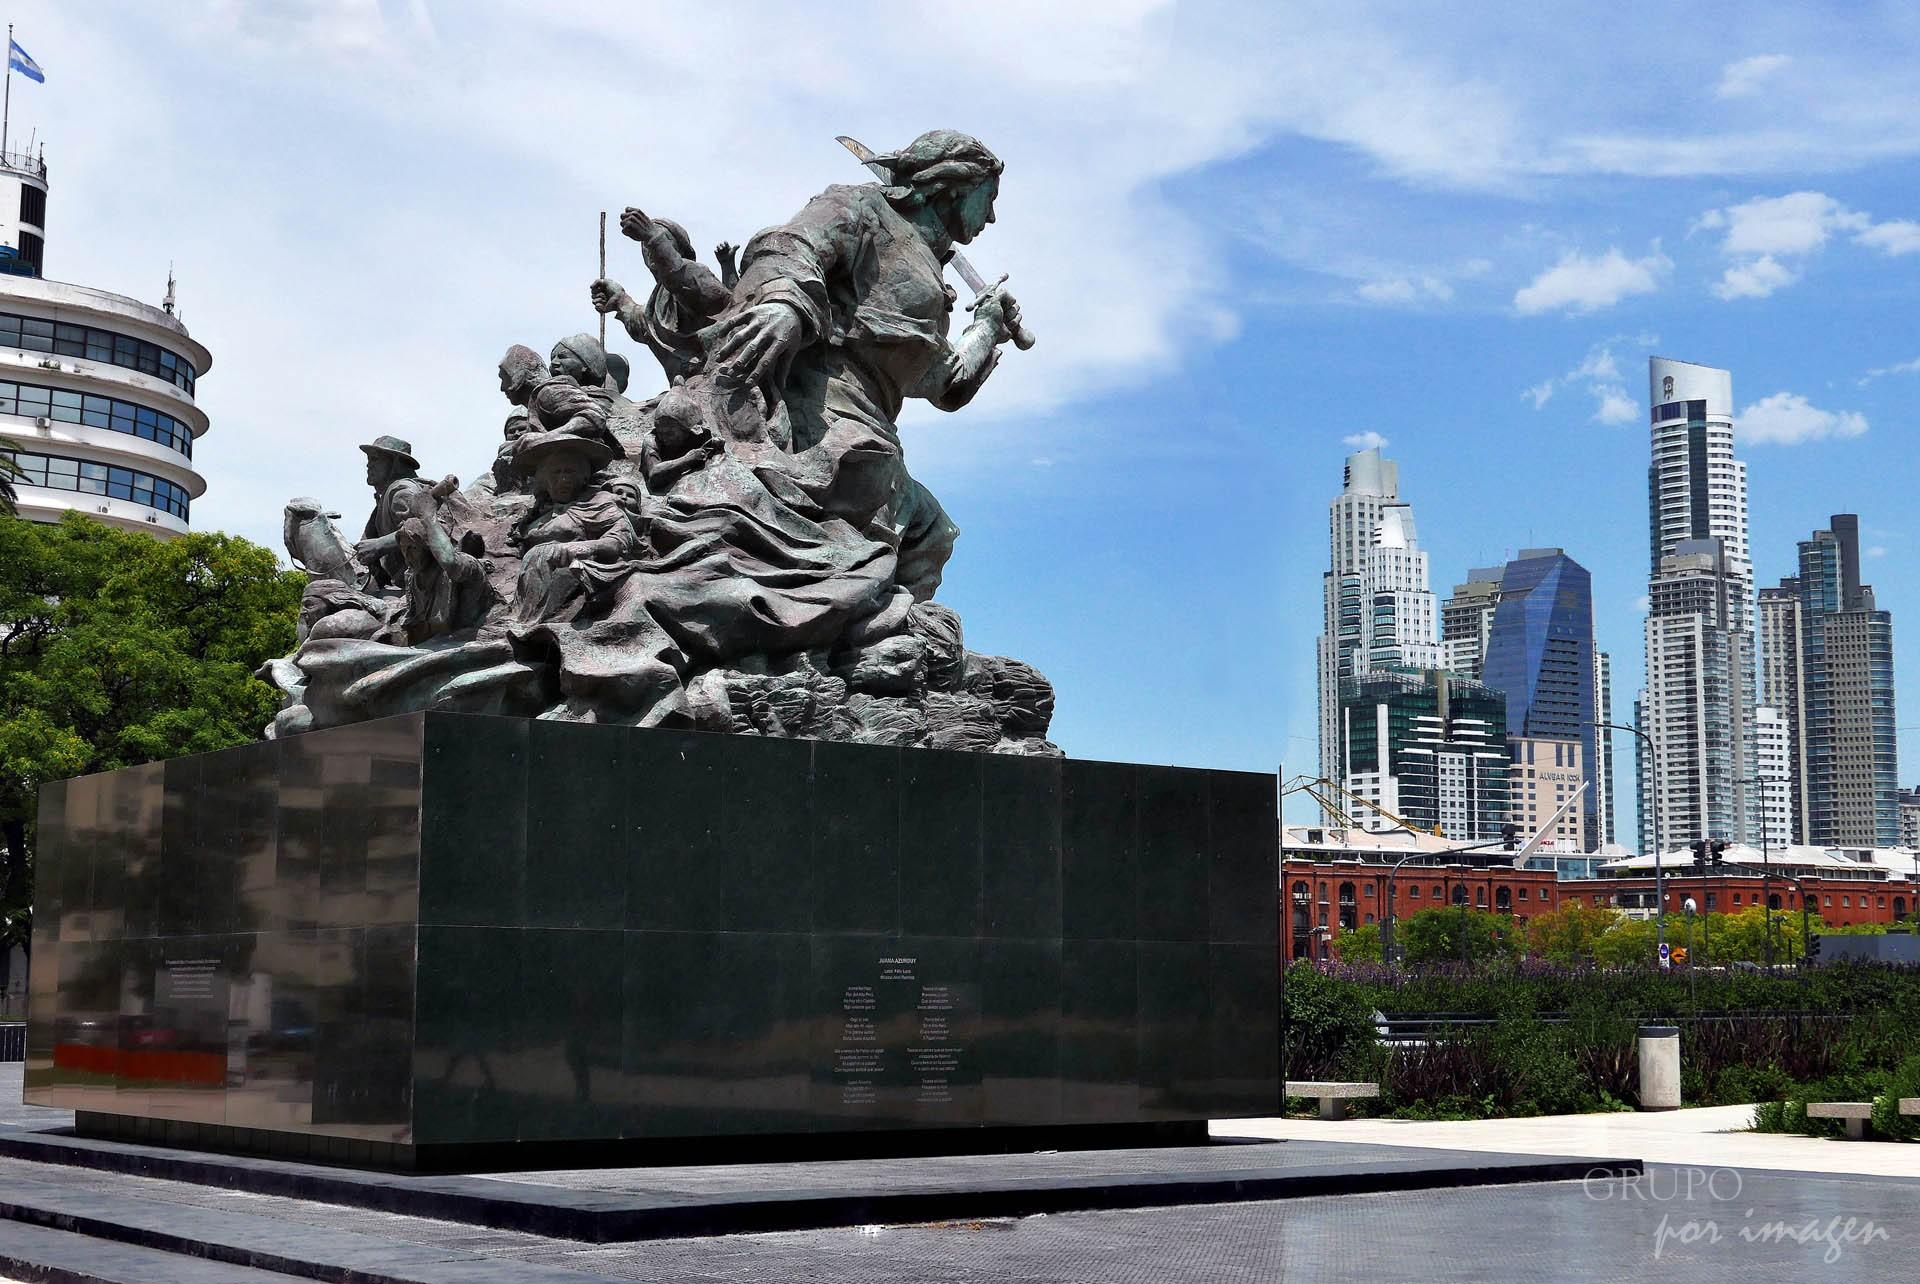 Monumento a Juana Azurduy EB / Efraín David